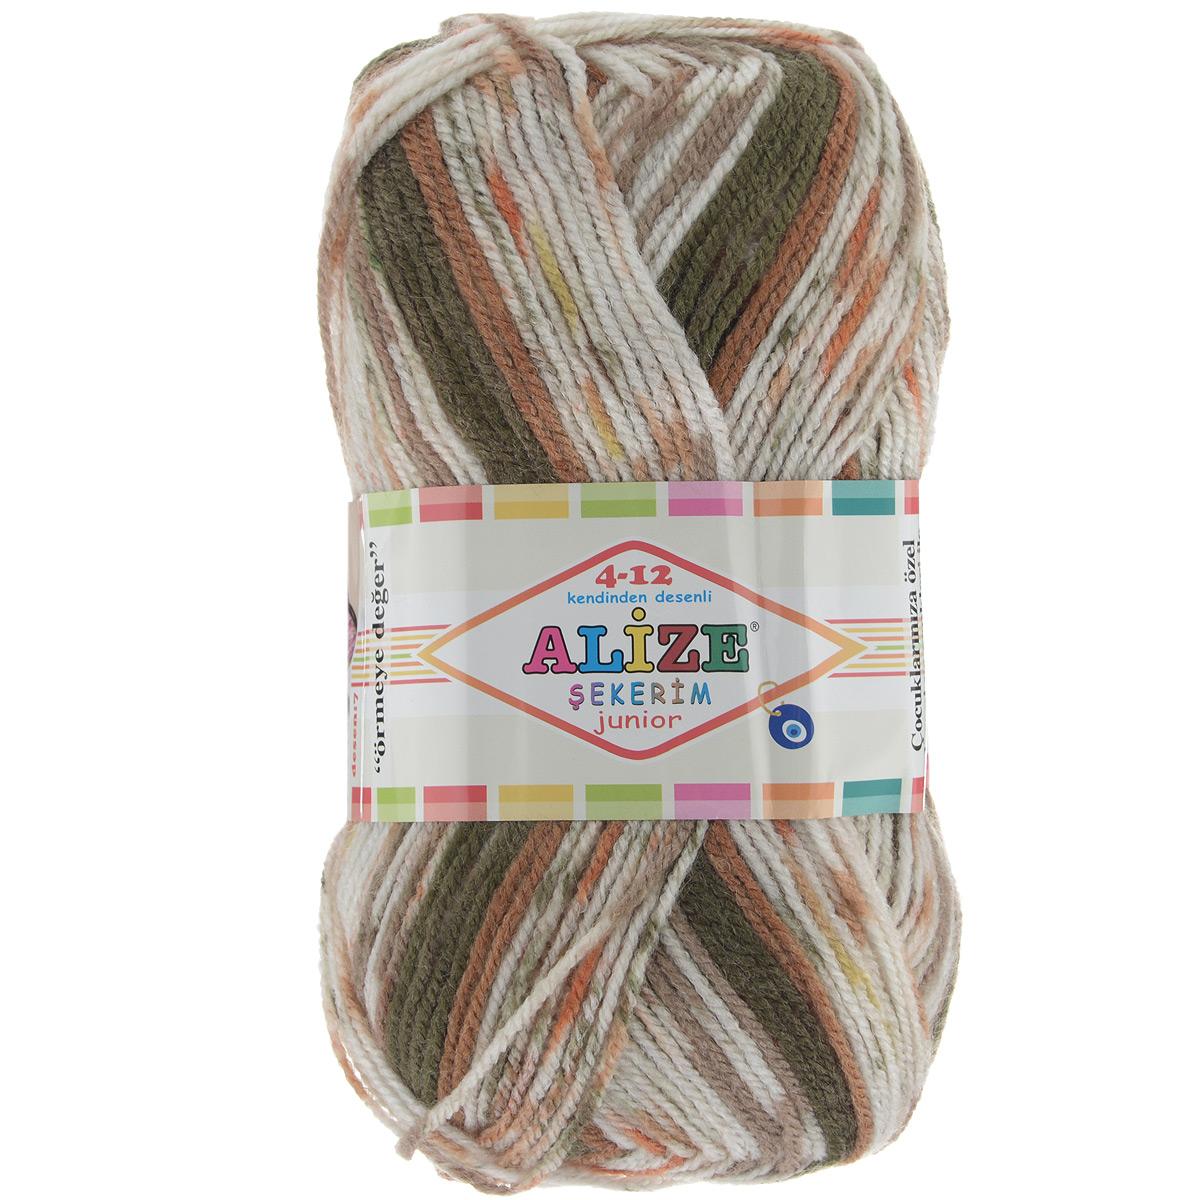 Пряжа для вязания Alize Sekerim Junior, цвет: бежевый, бурый, коричневый (712), 320 м, 100 г, 5 шт цена